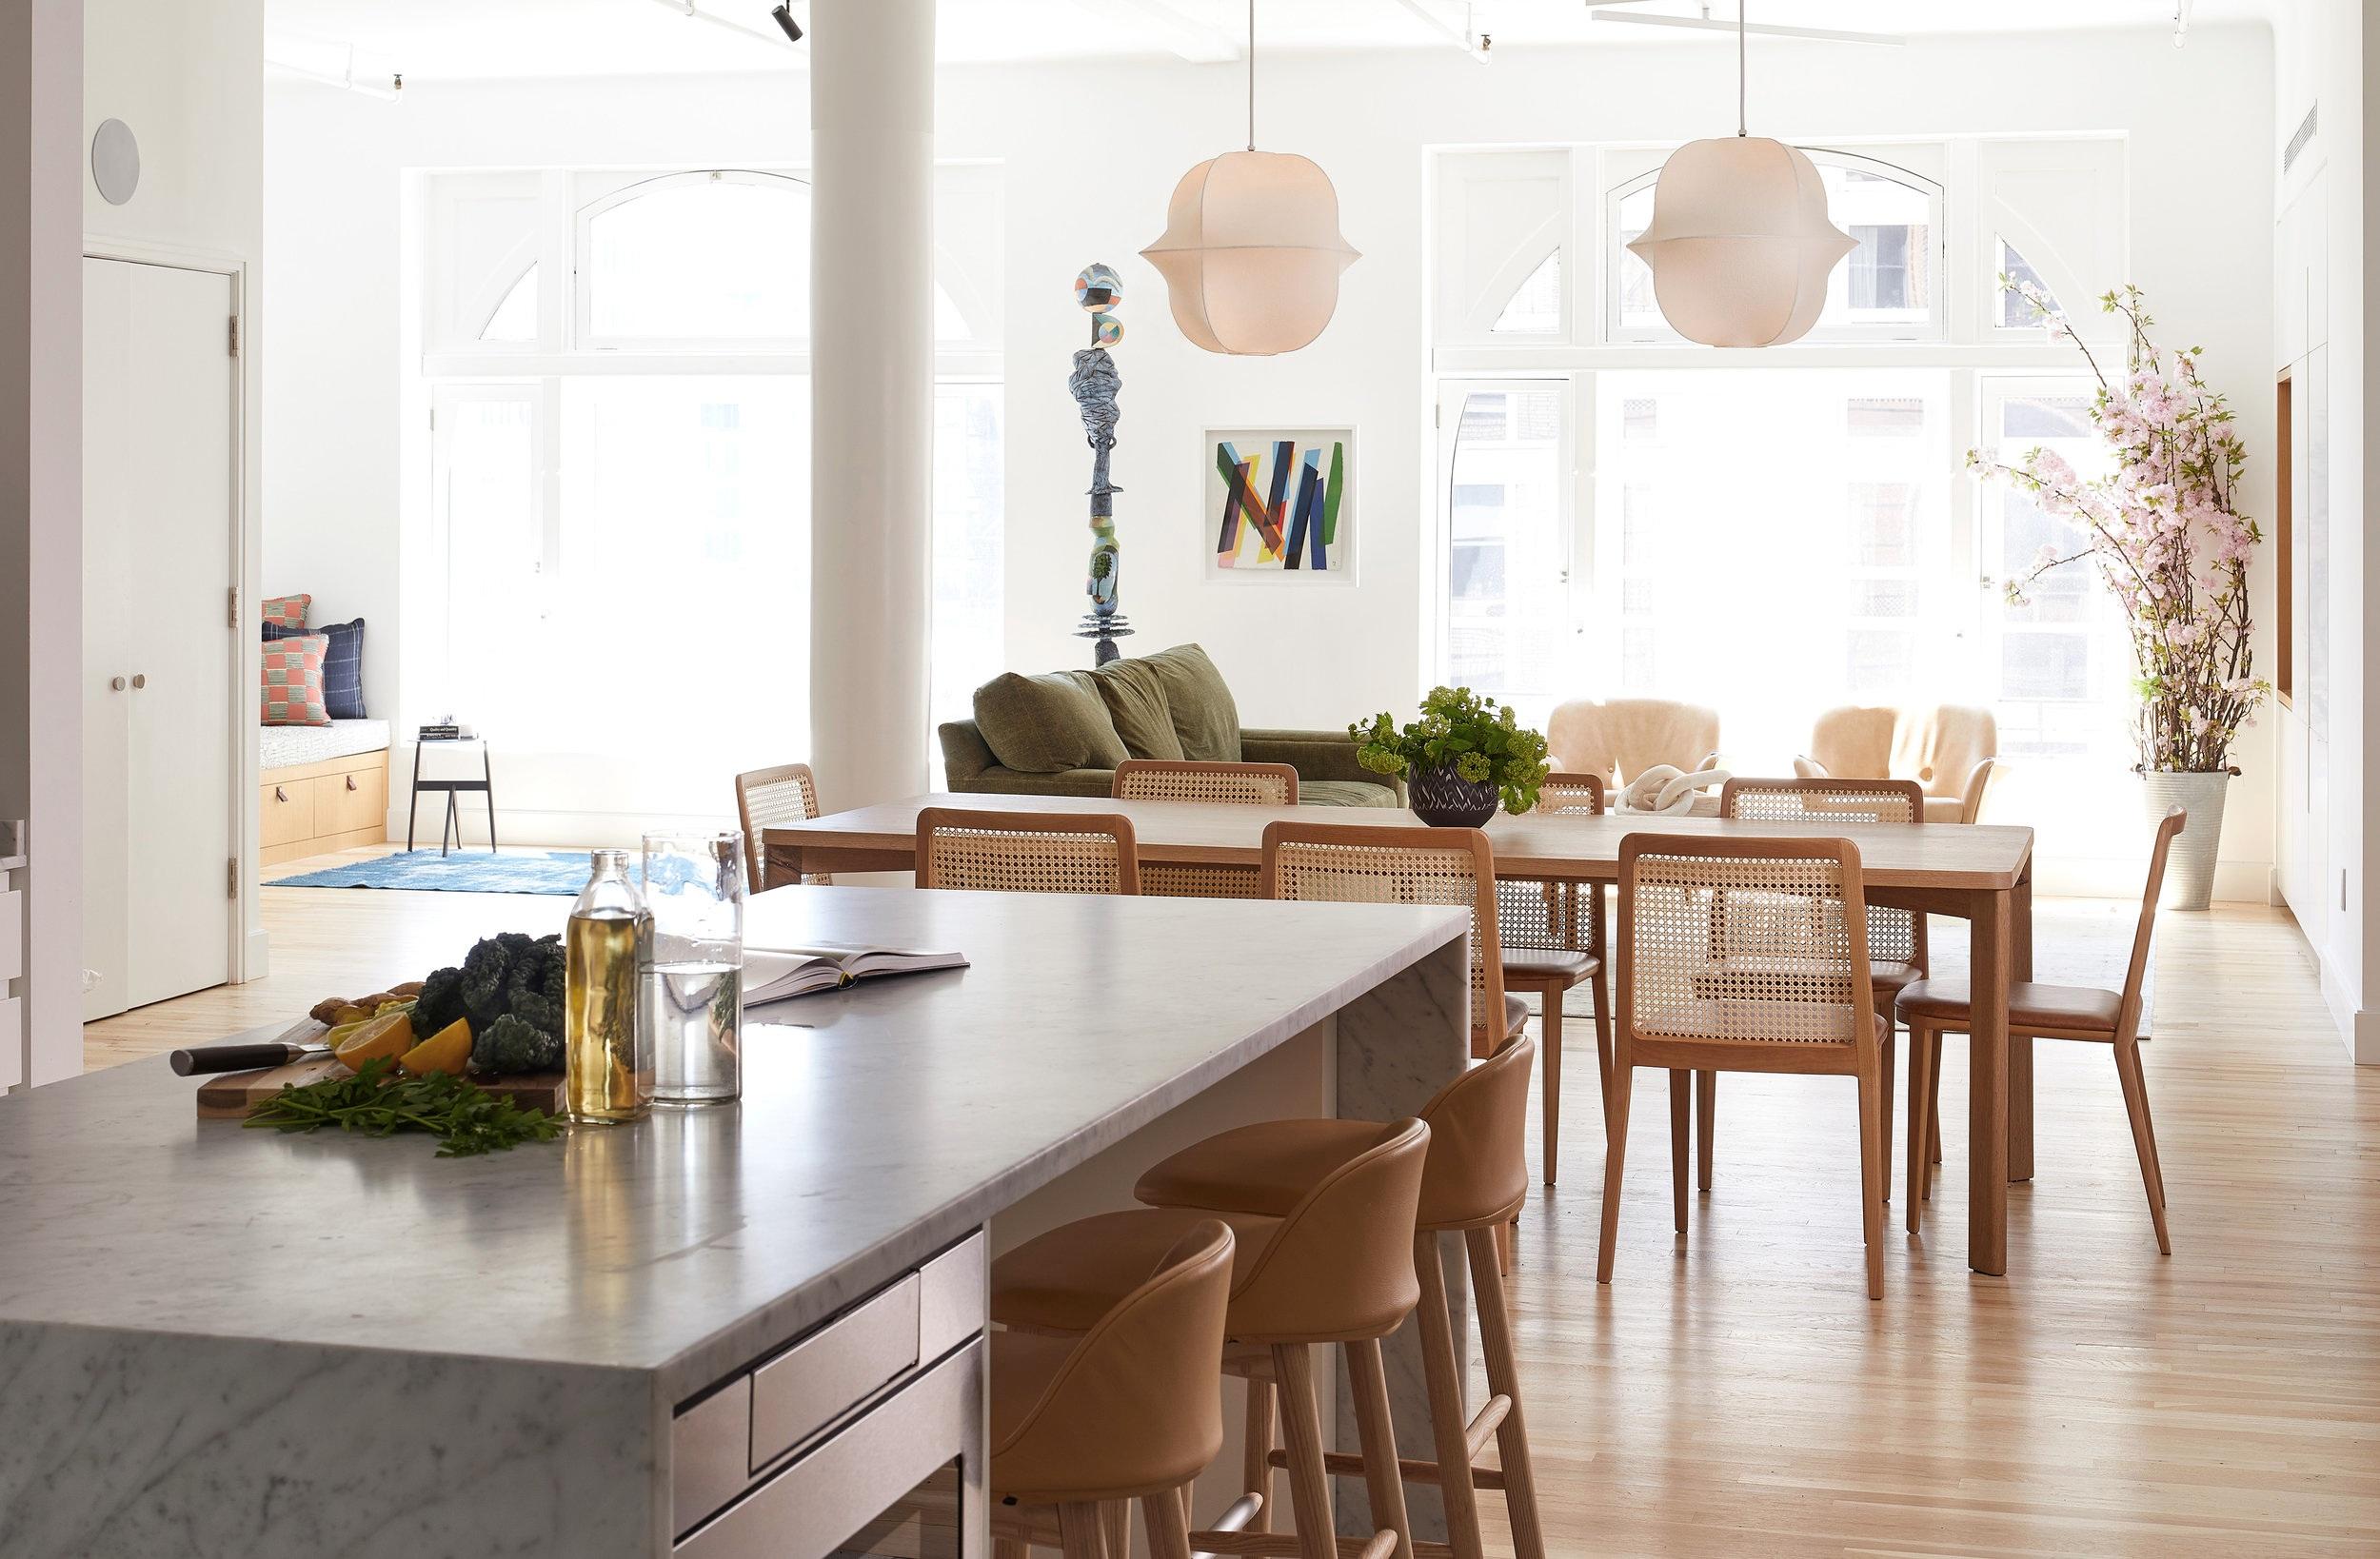 Shadow_Arch+Nomad+Loft+Dining+Room+Kitchen+2.jpg